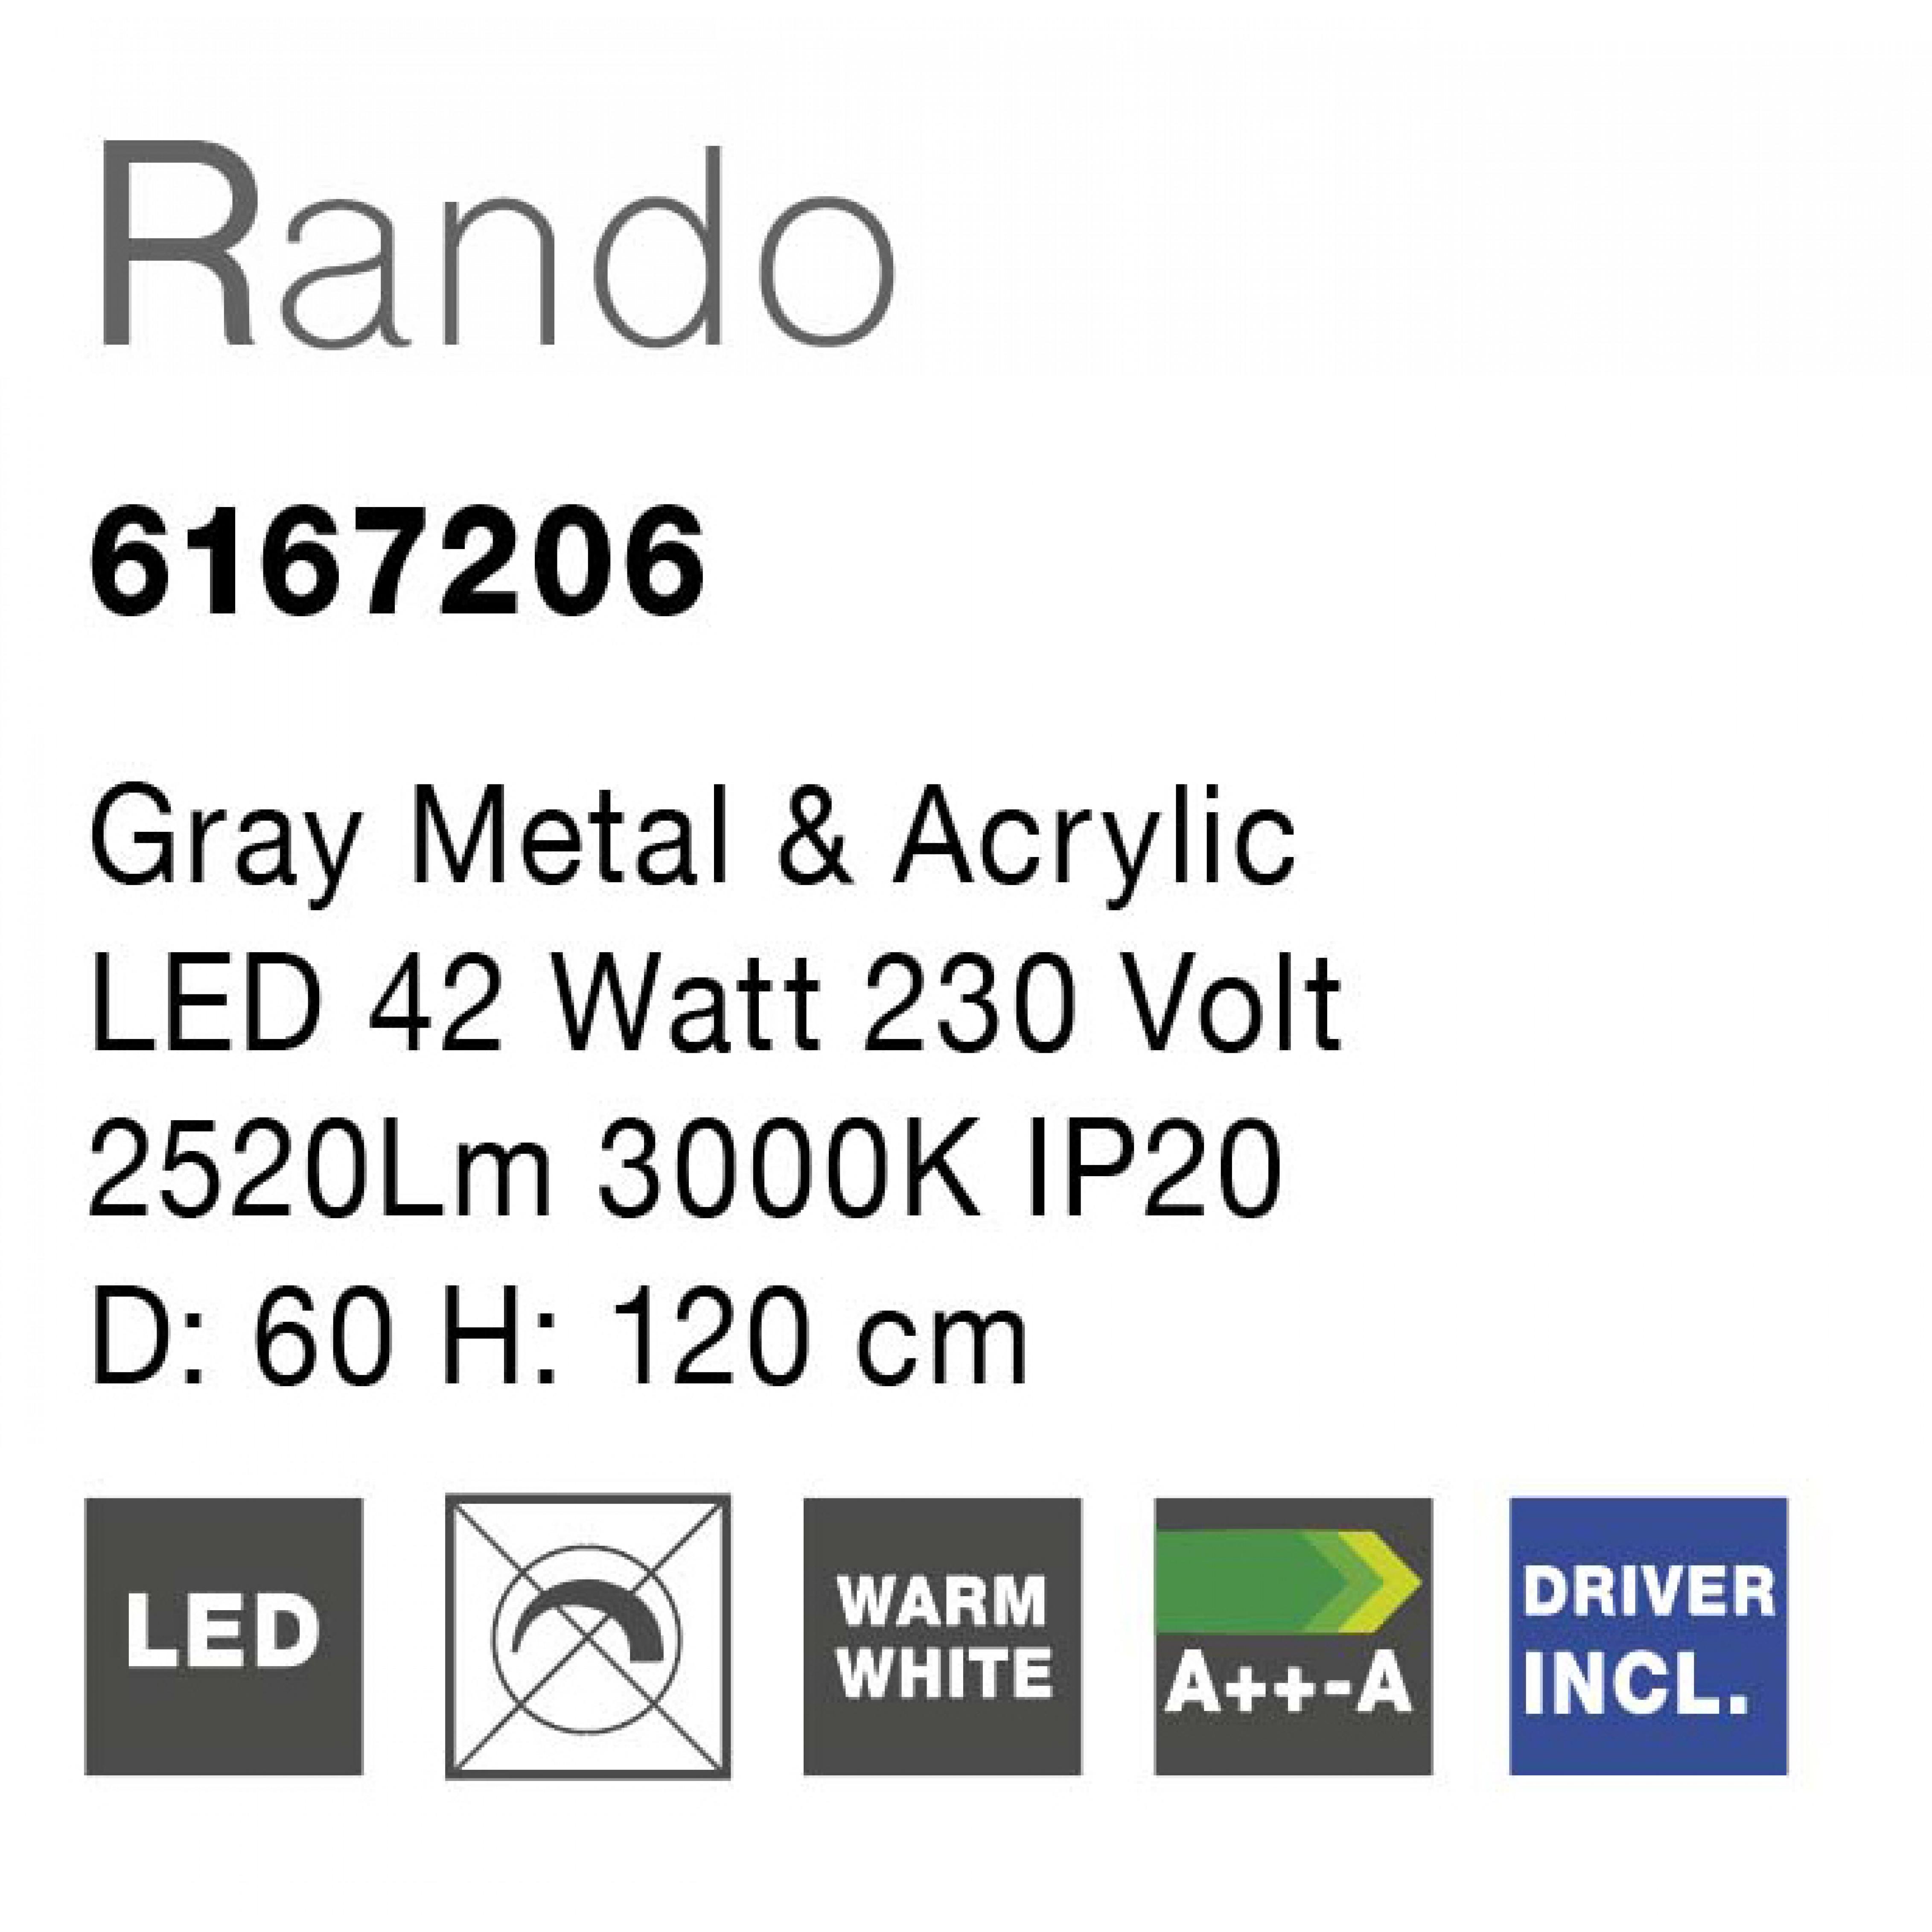 Pendelleuchte Rando T 60 cm H 120 cm   Grau